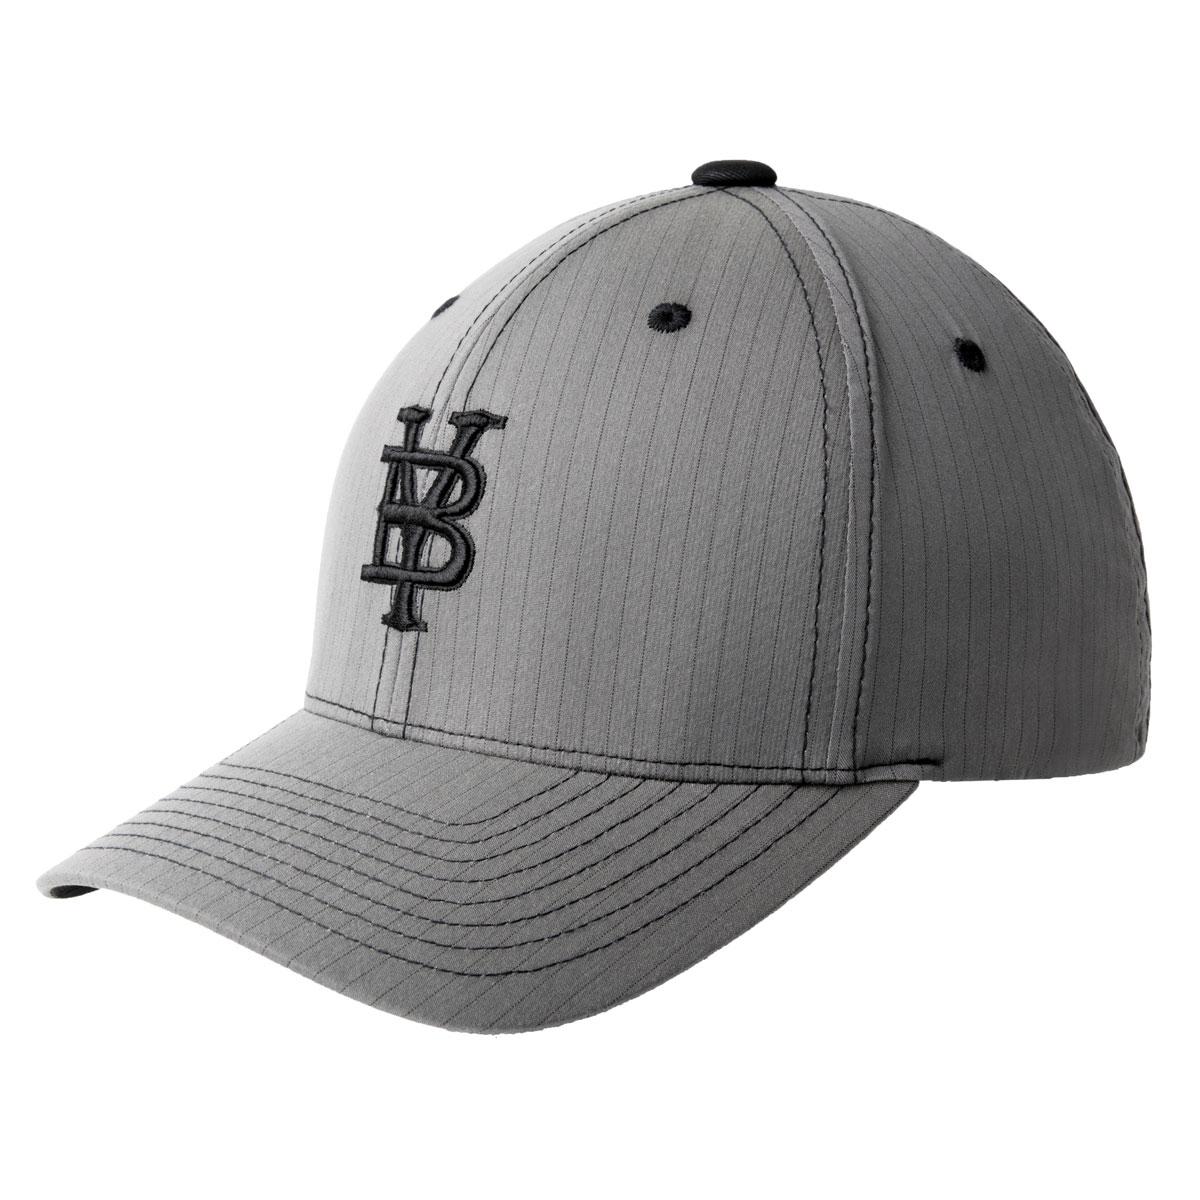 Bailey Western Legion Baseball Cap in Charcoal Pinstripe